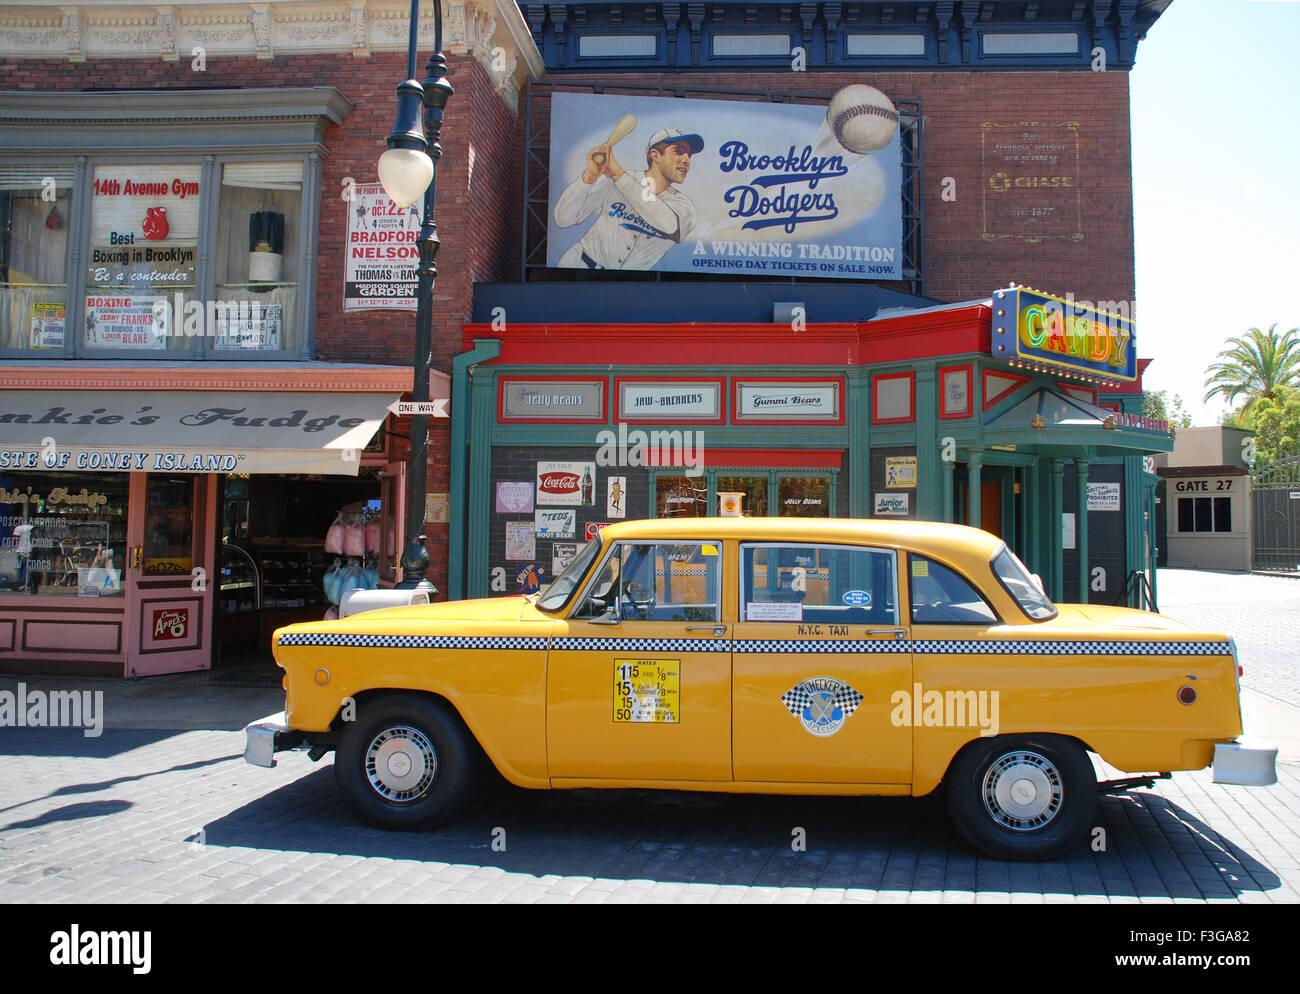 Universal Studios ; Los Angeles ; California ; U.S.A. United States of America - Stock Image